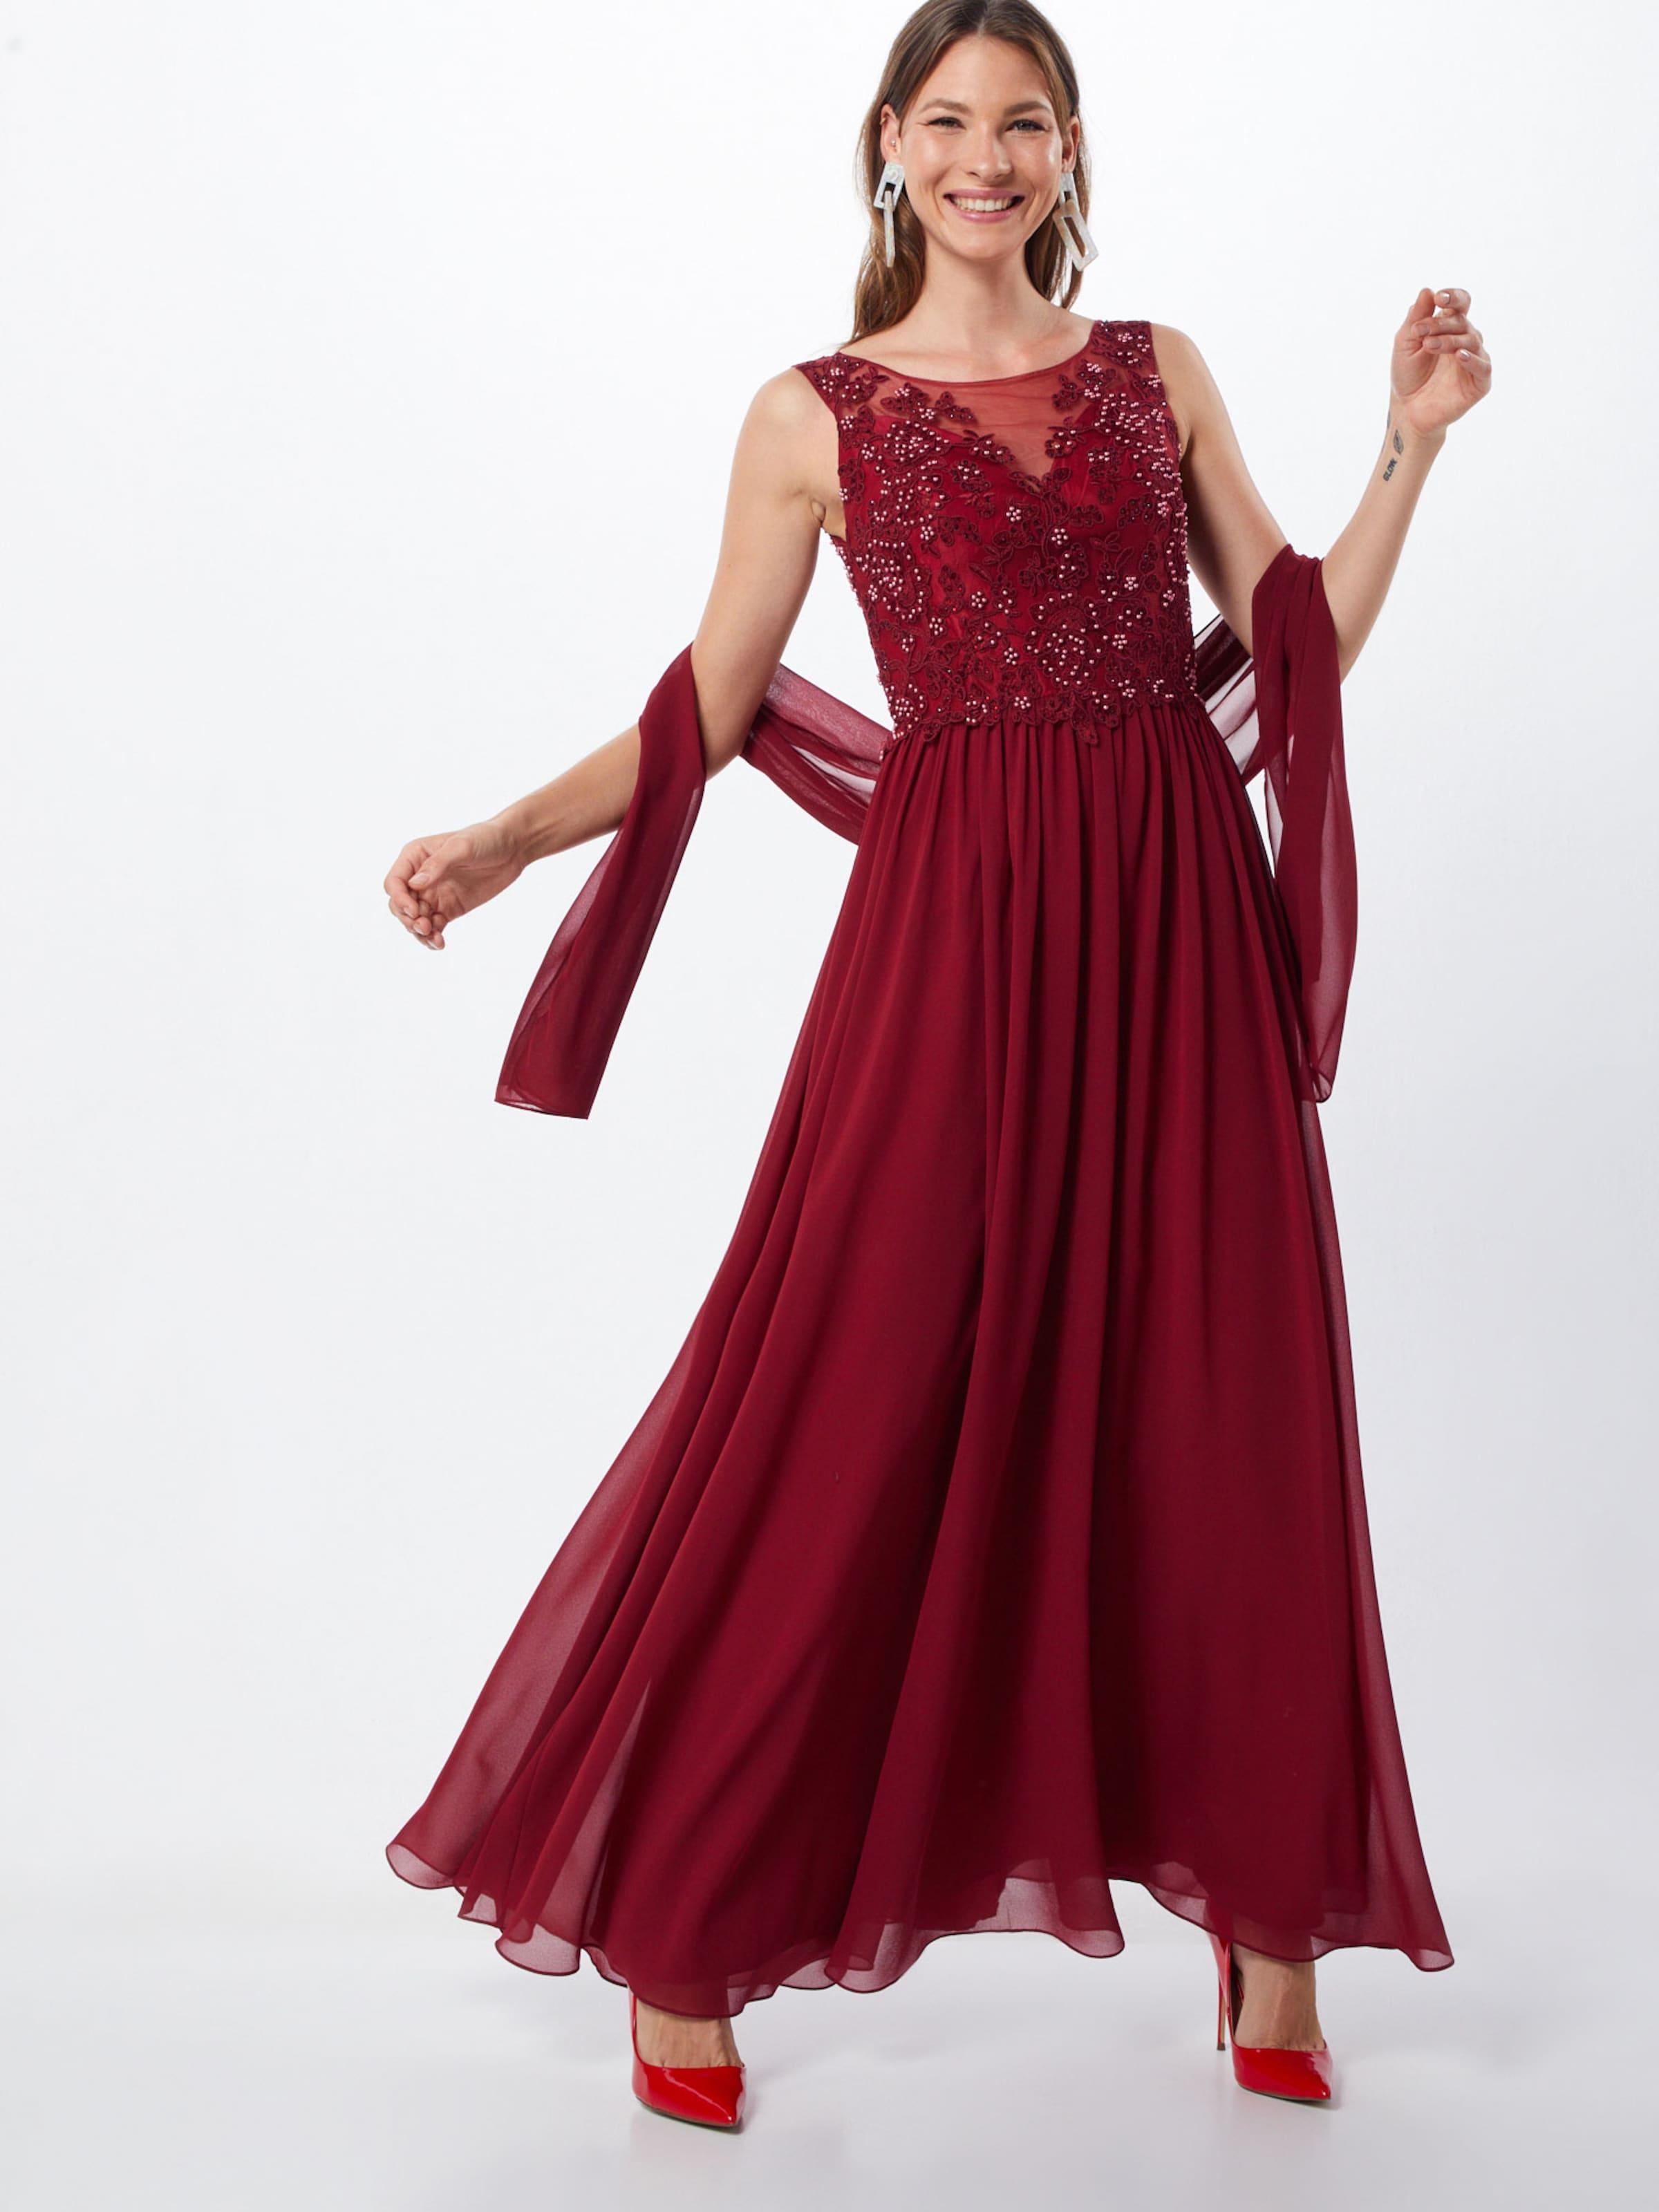 Lace' Mascara In Kleid 'beaded Weinrot SMVpzU